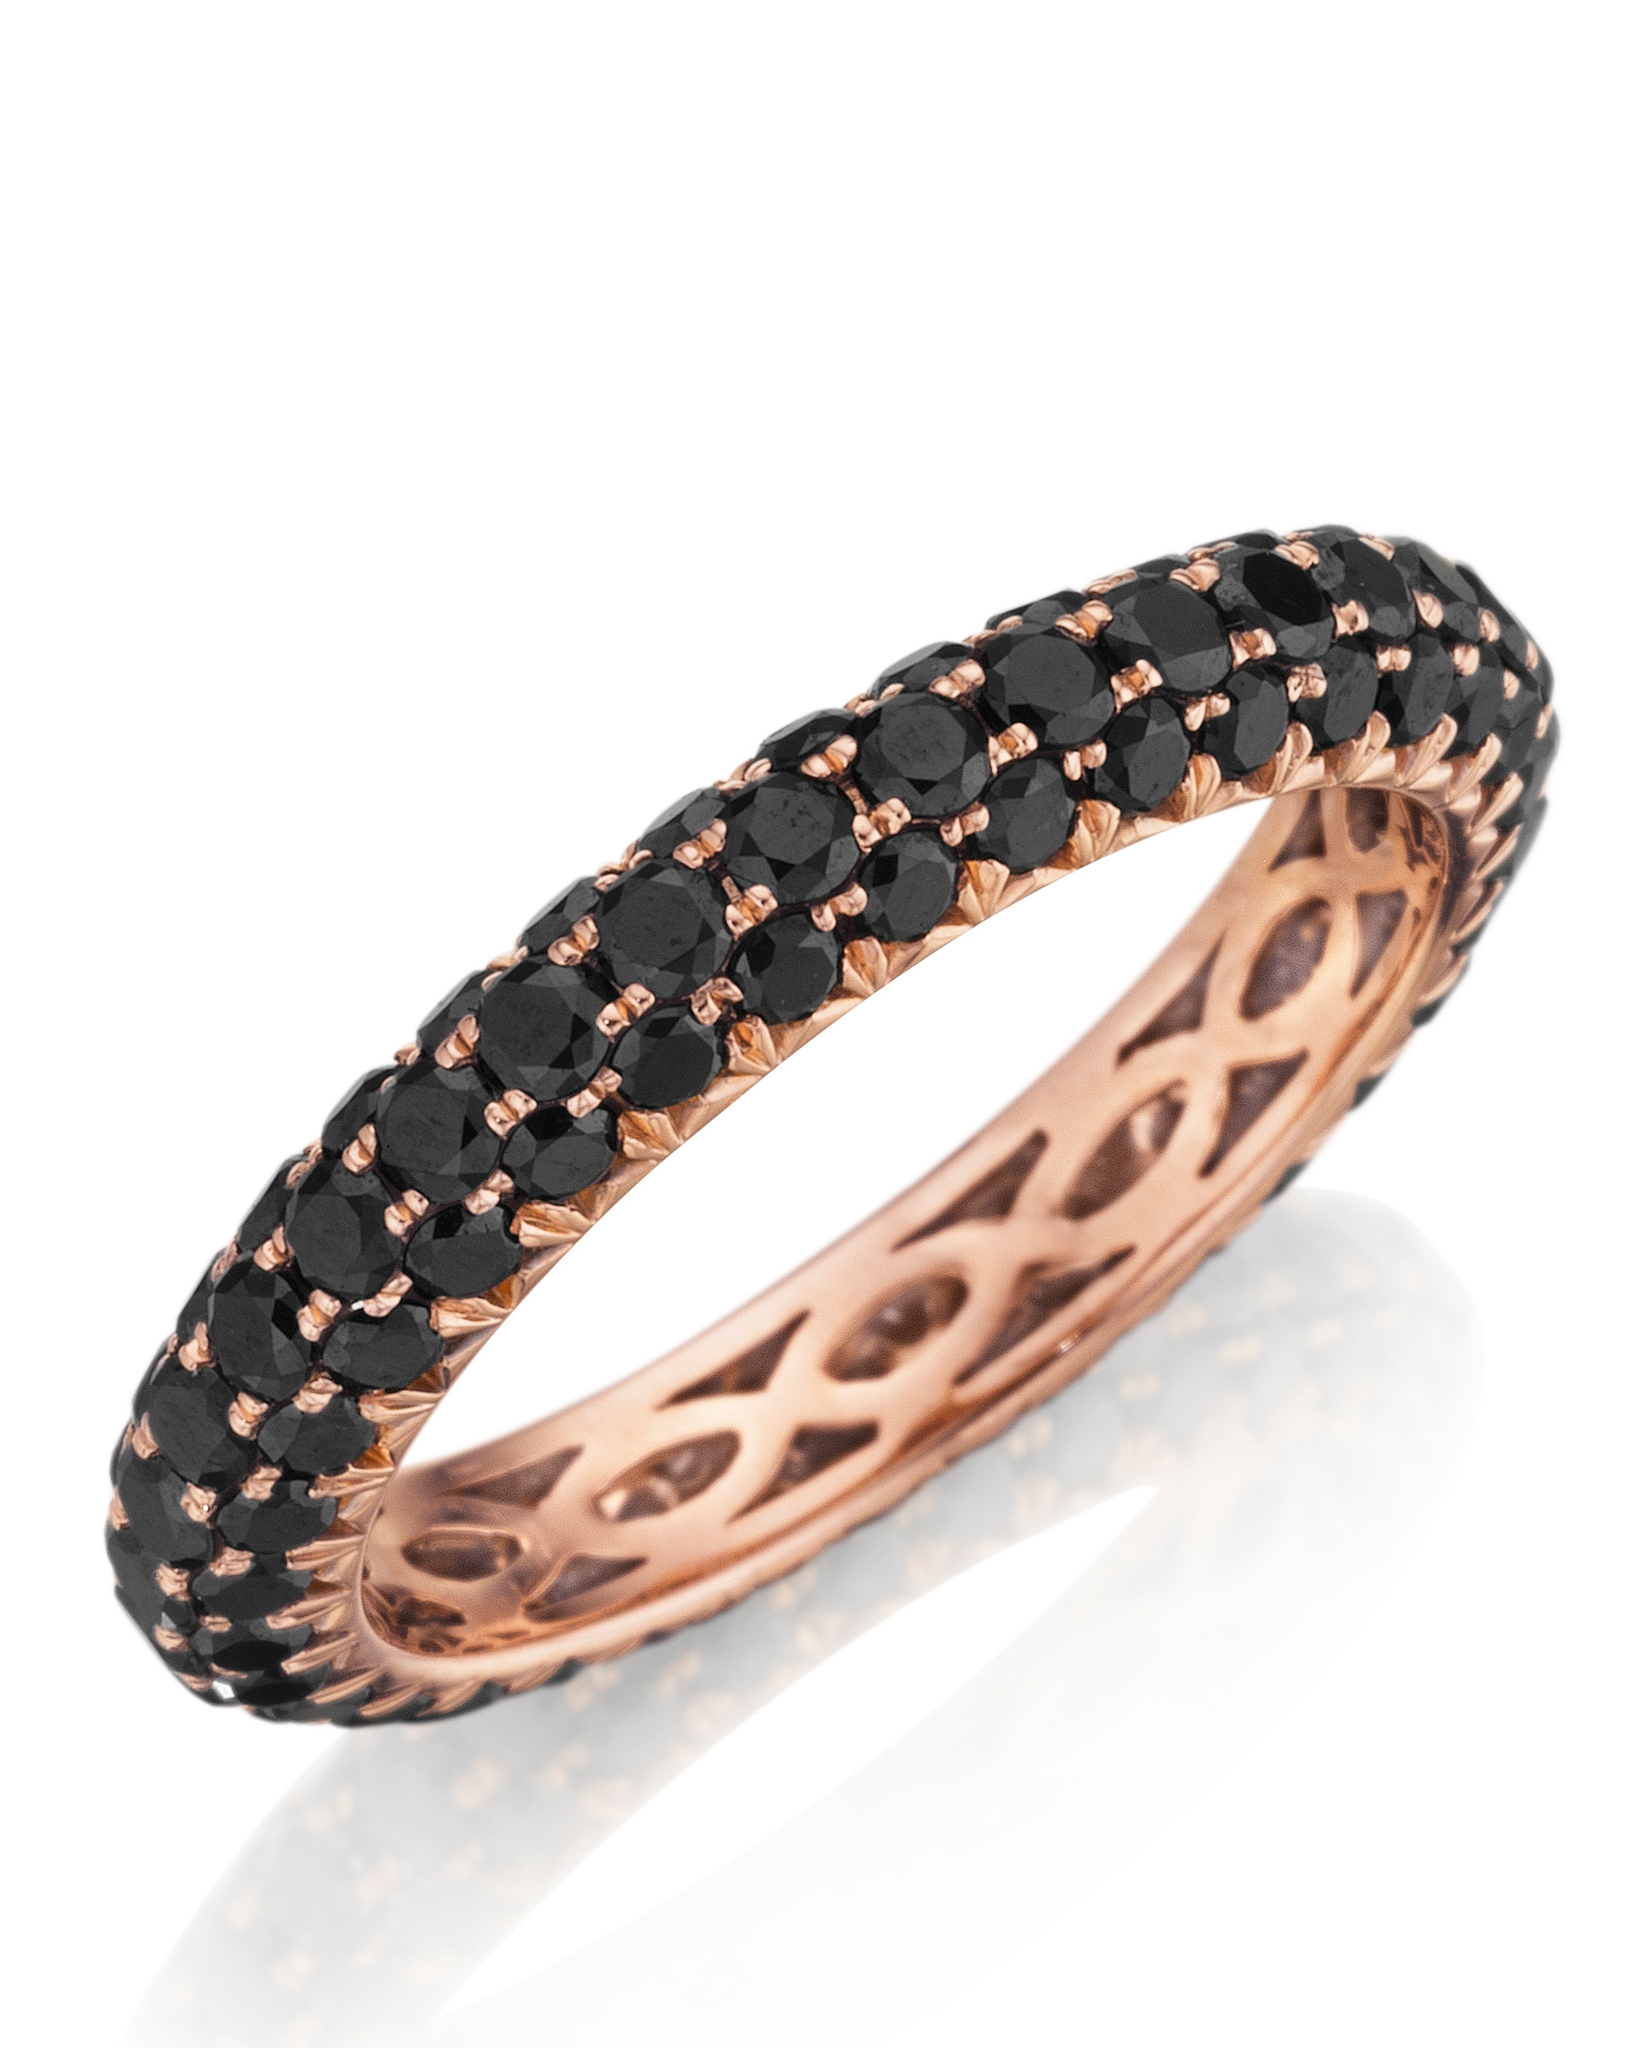 black-diamond-engagement-rings-henri-daussi-1-0814.jpg